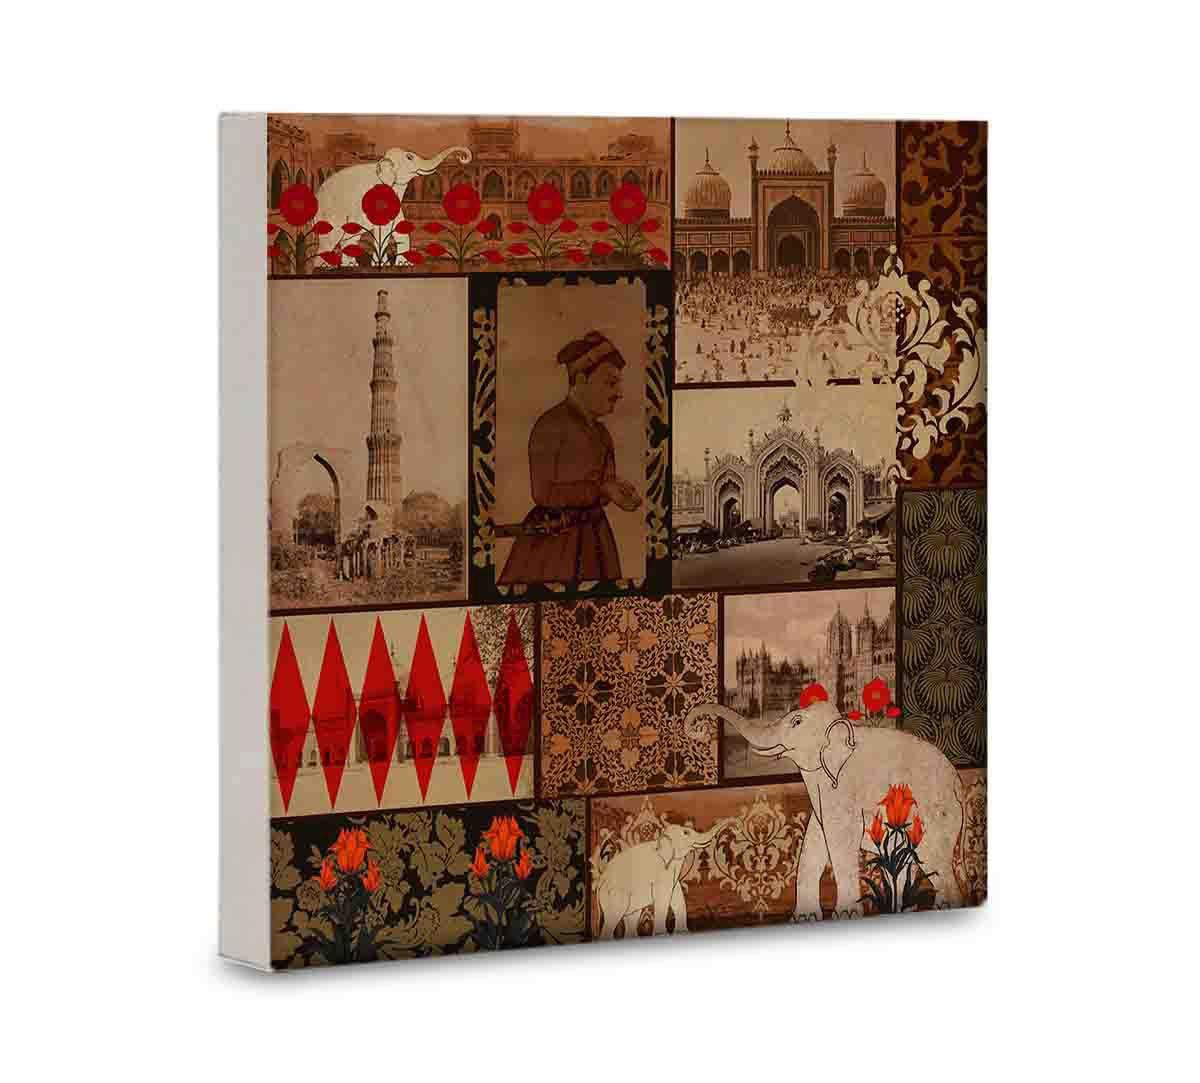 India Circus The Mughal Era 16x16 and 24x24 Canvas Wall Art